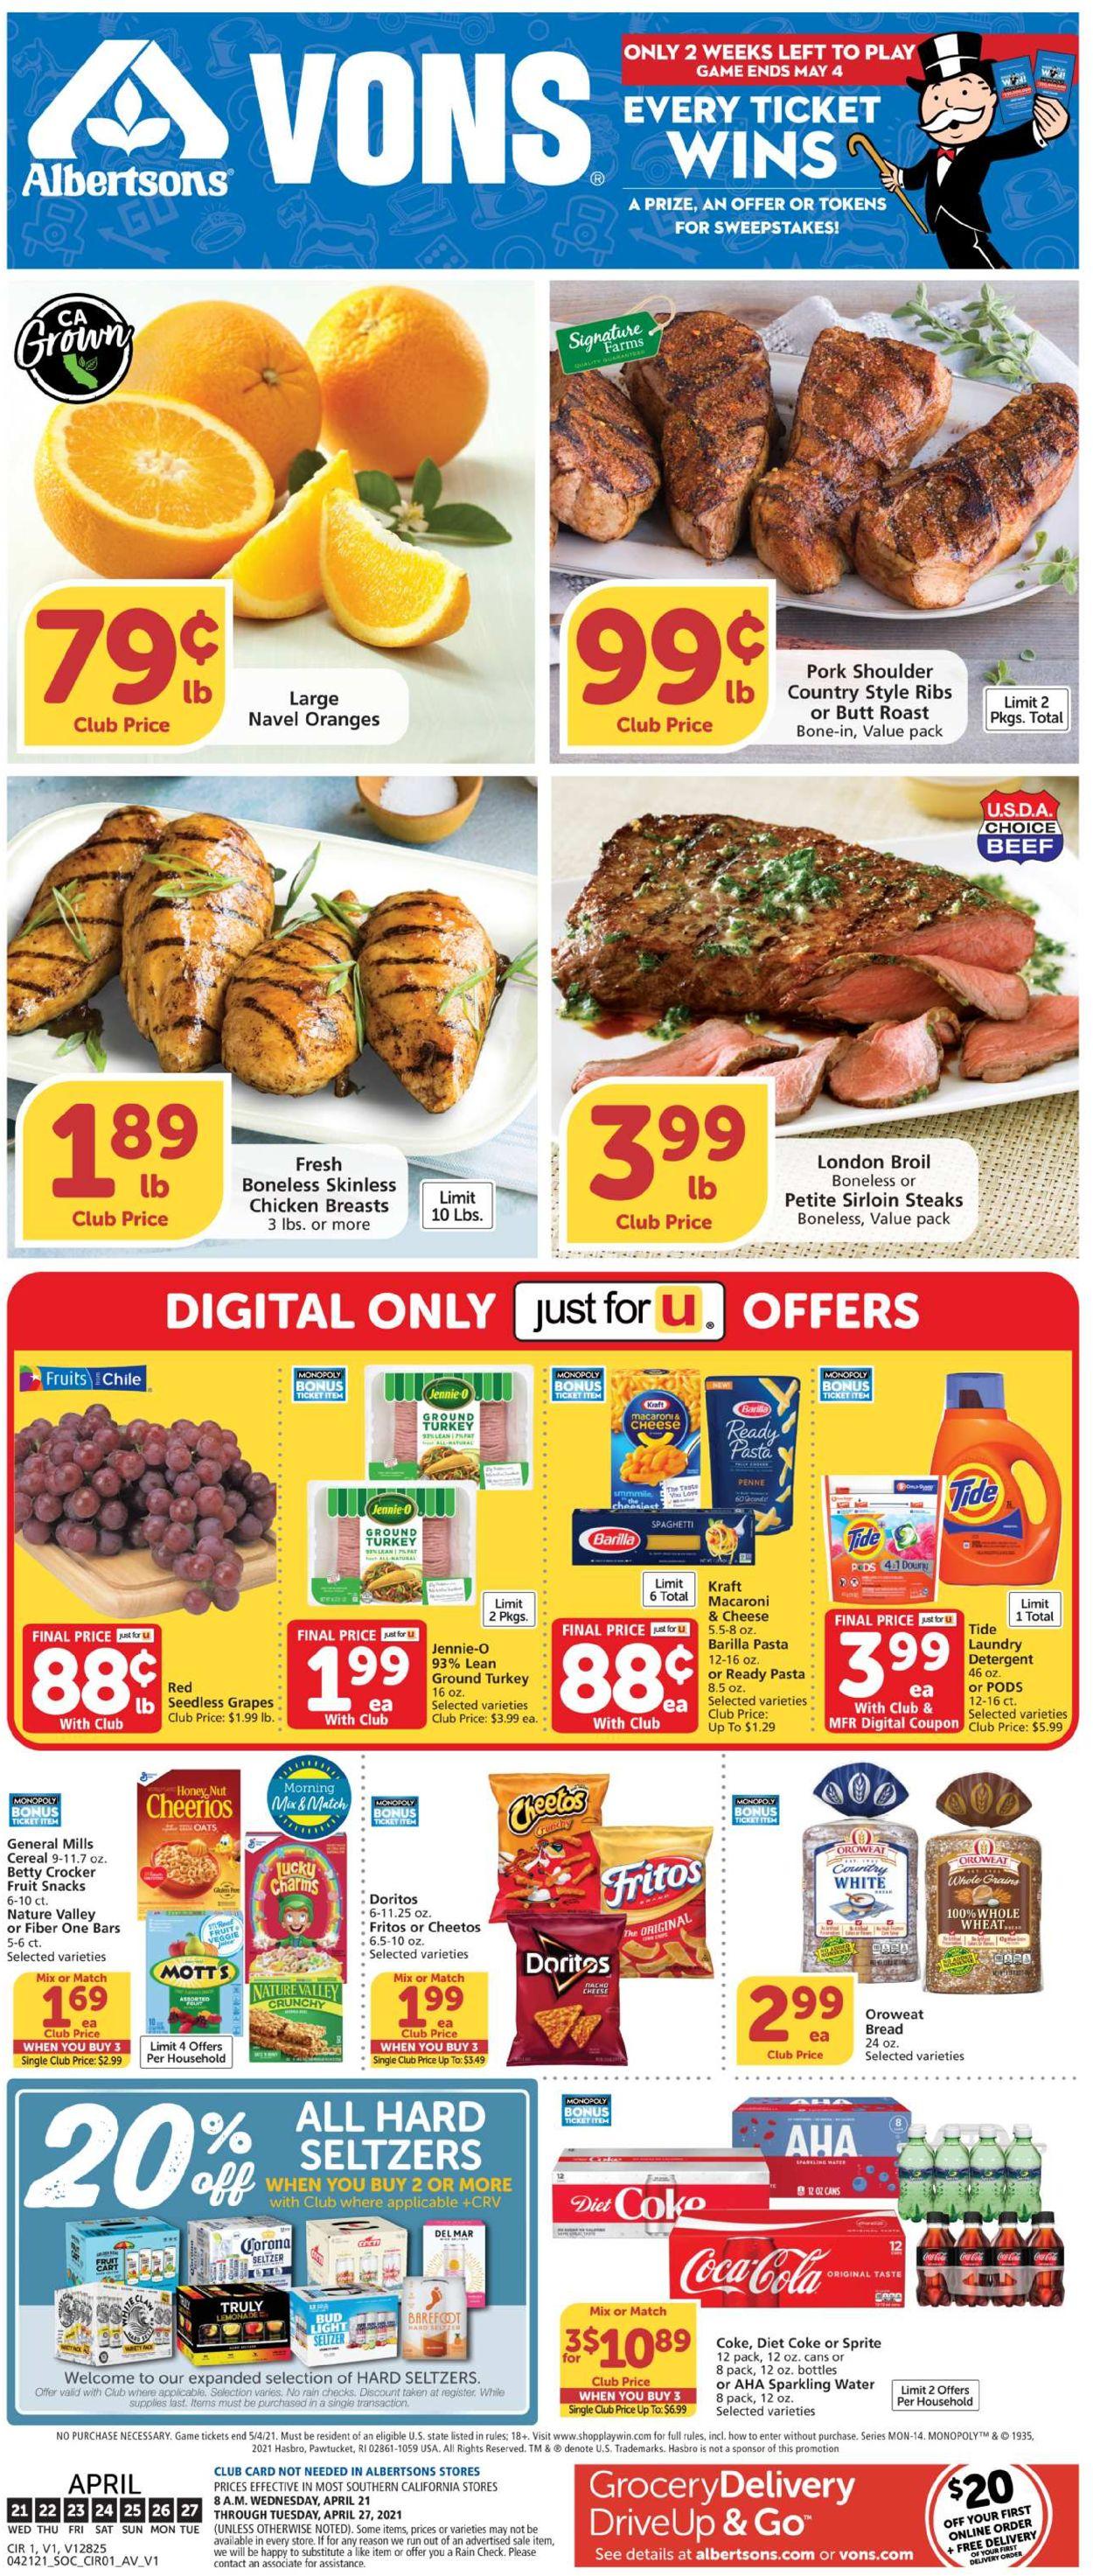 Vons Weekly Ad Circular - valid 04/21-04/27/2021